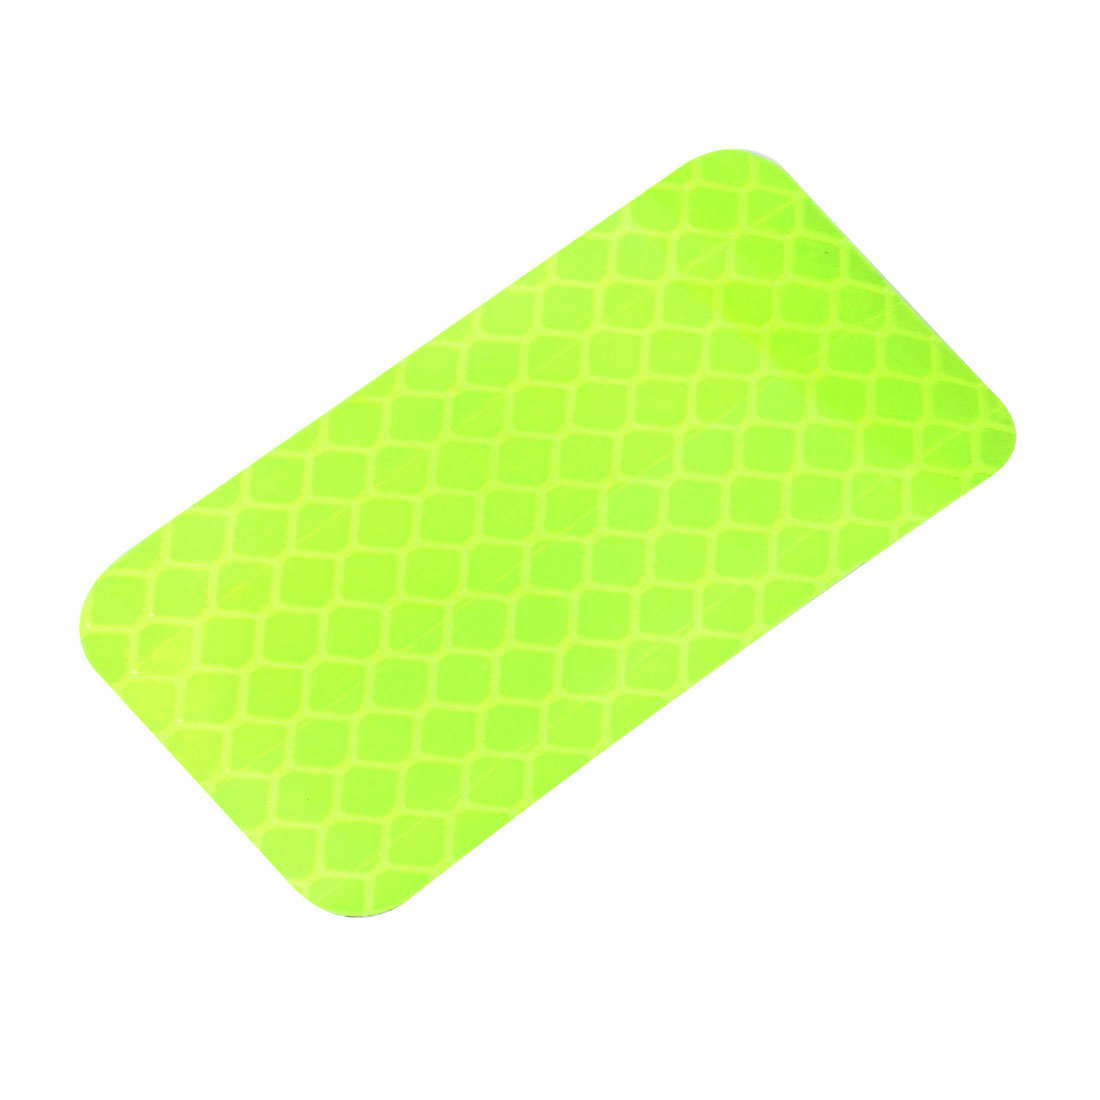 Honeycomb Reflective Warning Tape Film Sticker Yellow 30mm x 60mm